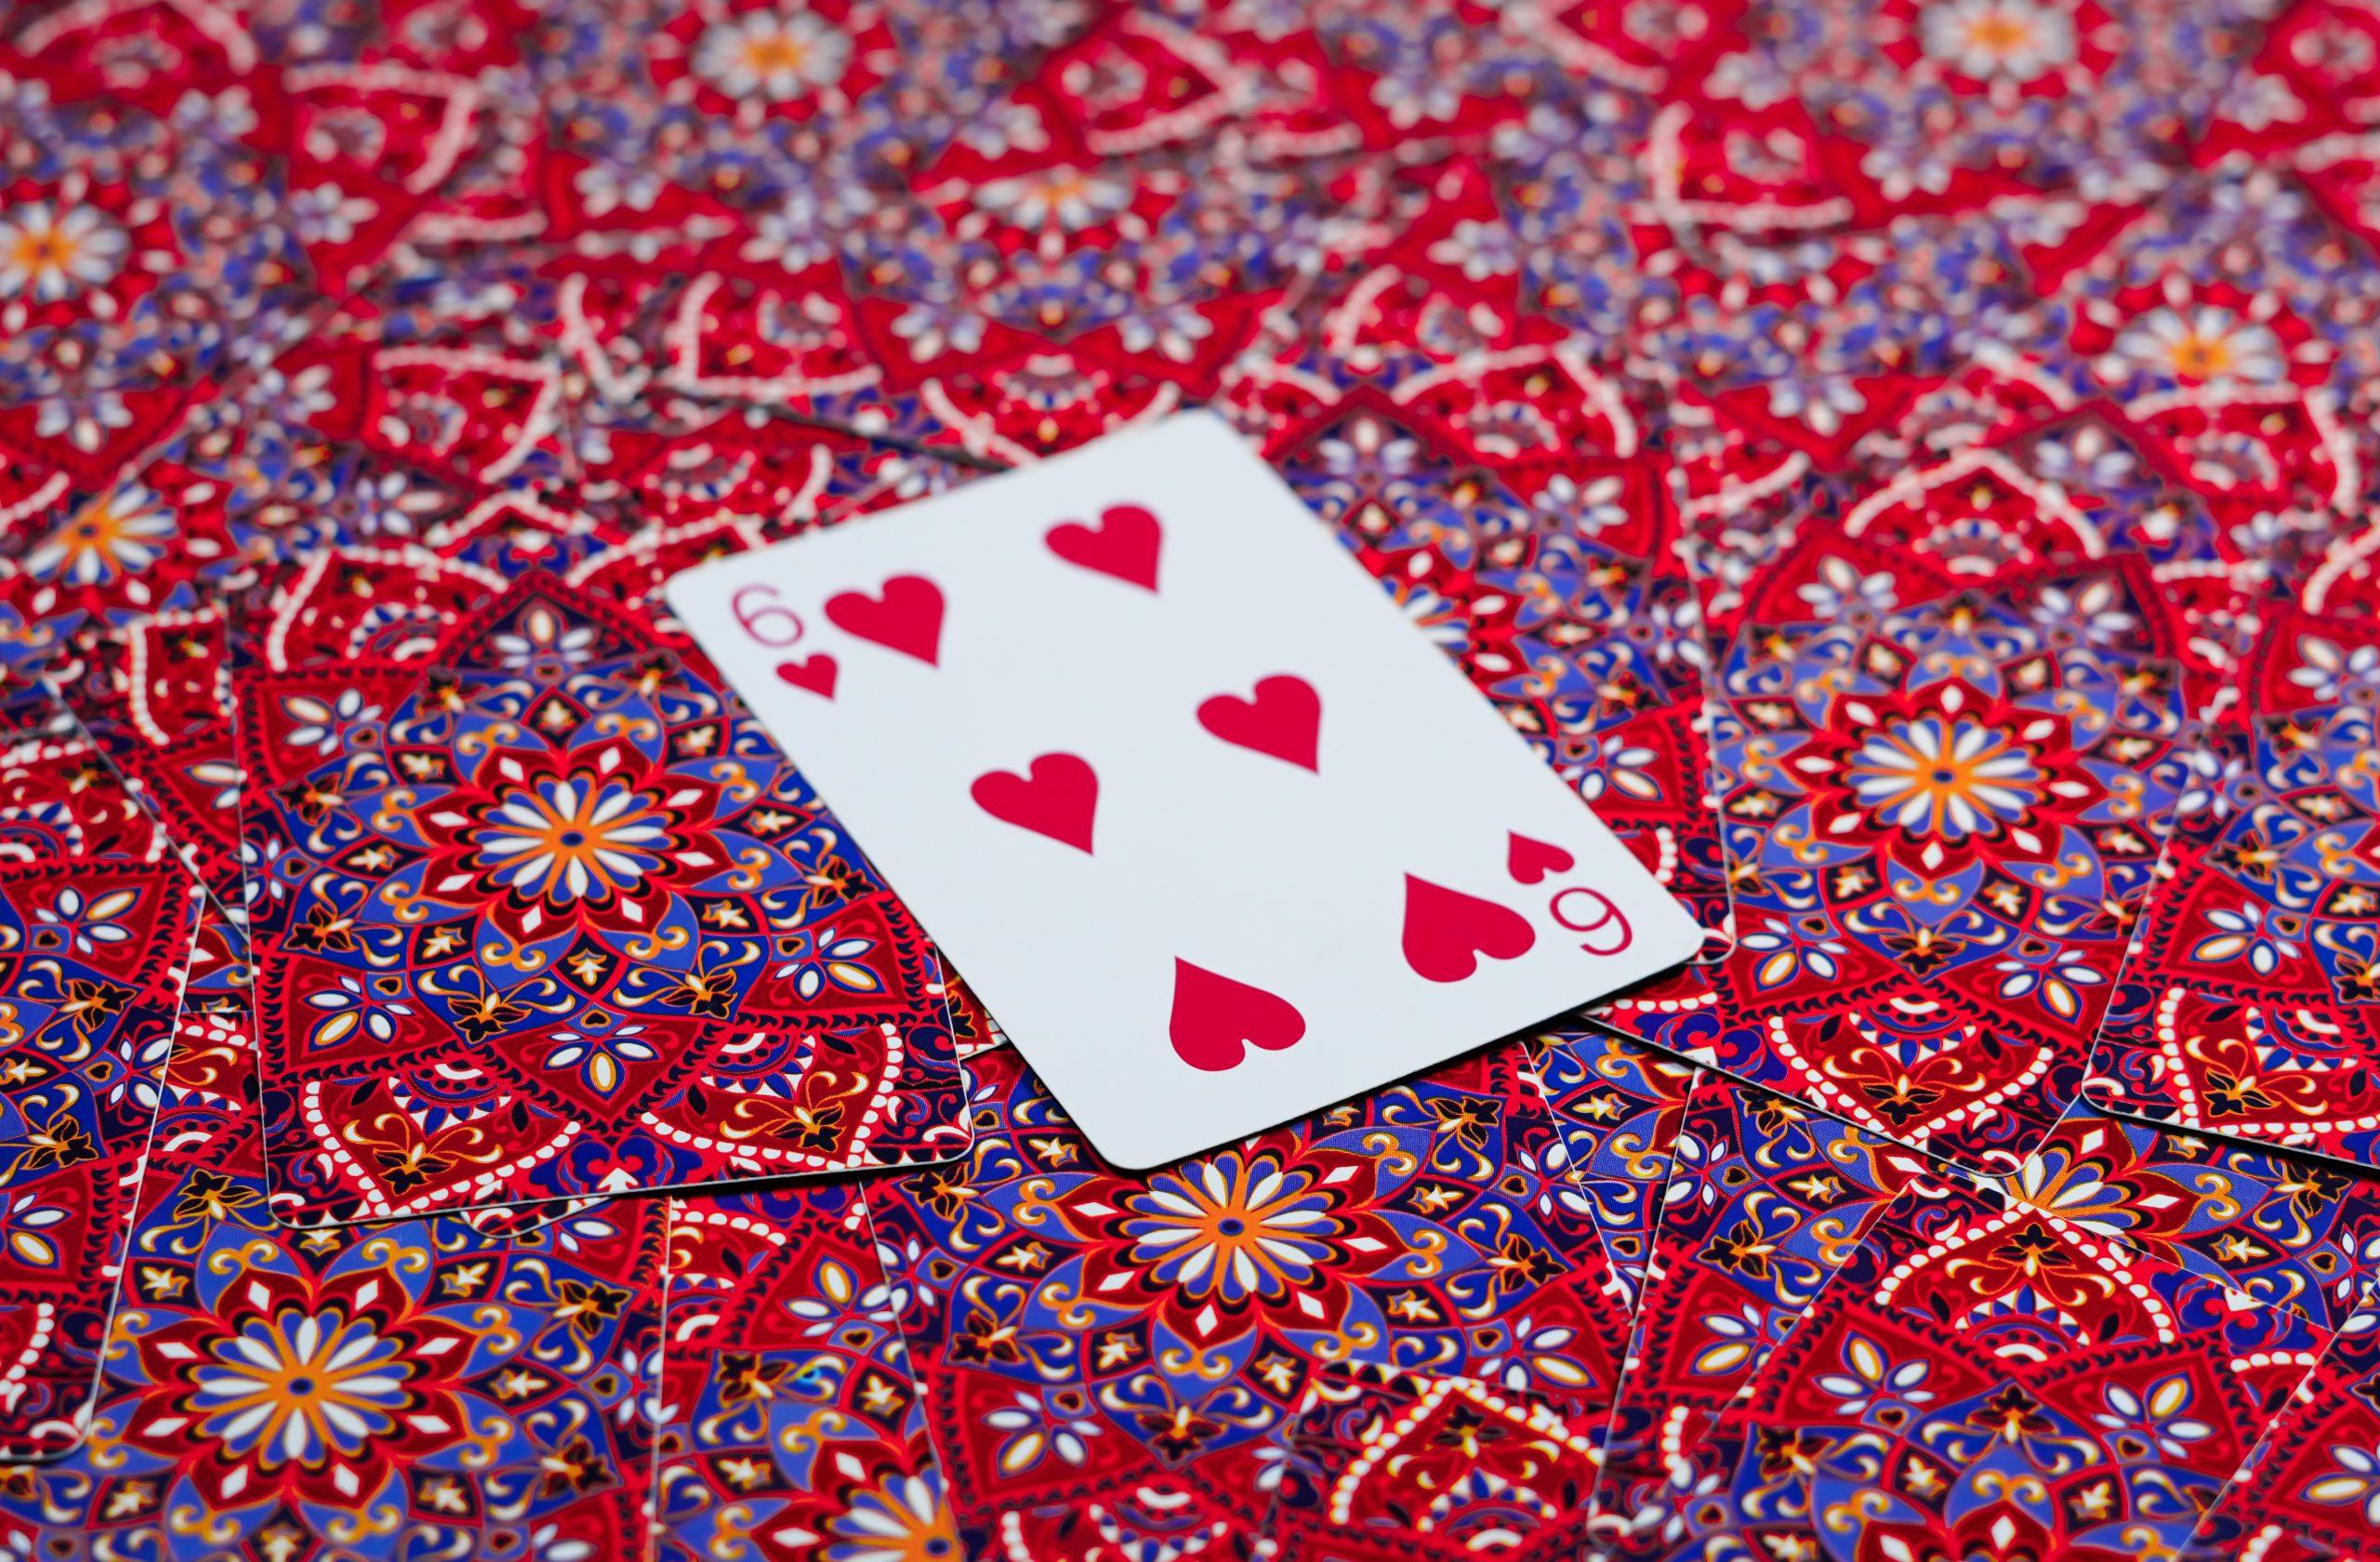 Six of Heart Card